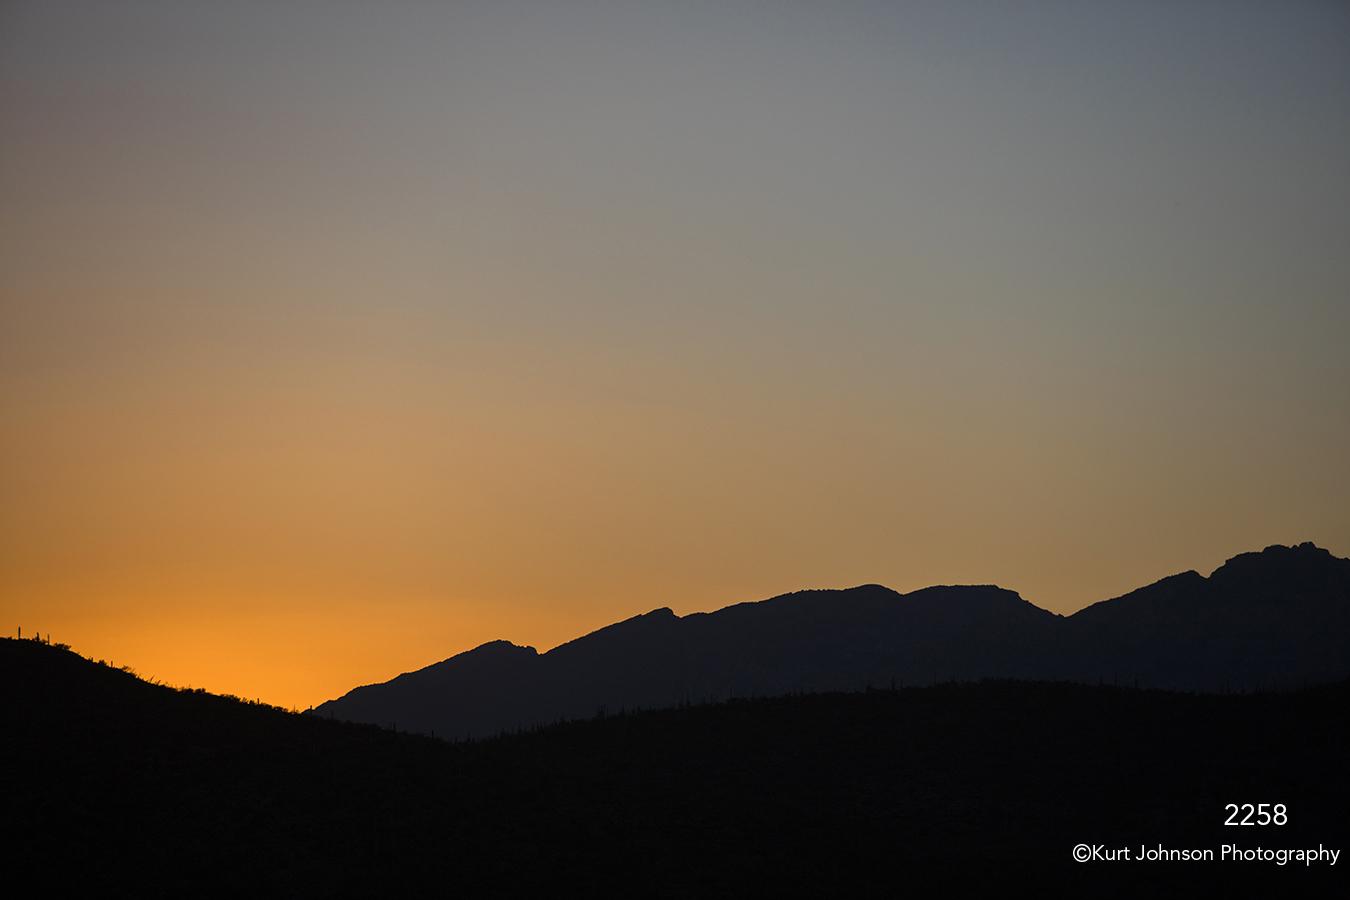 southwest mountains desert sunset orange yellow